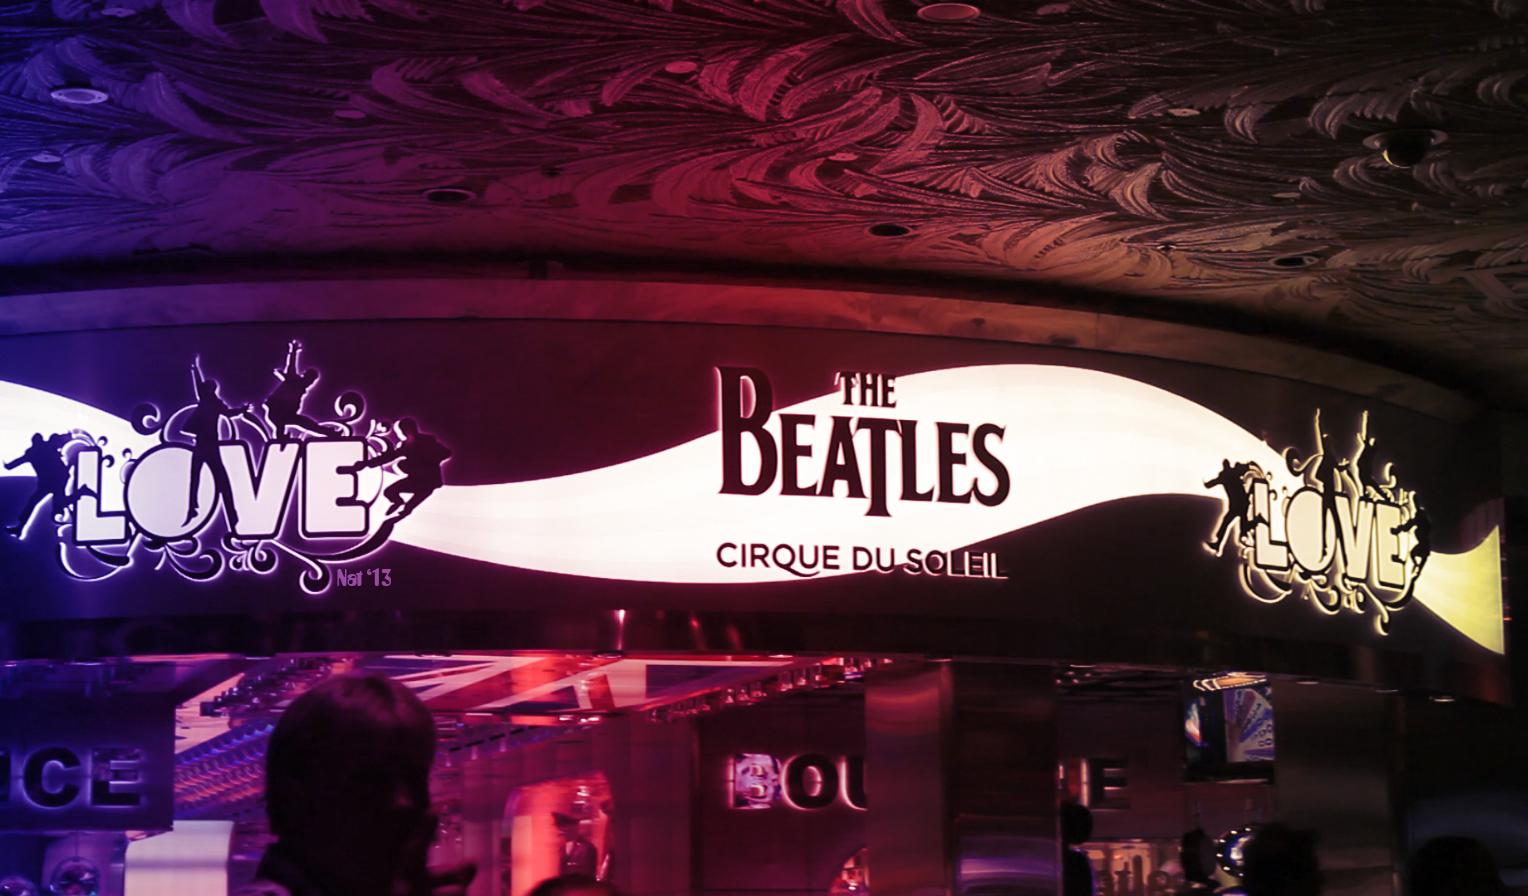 Beatles LOVE by NatPal